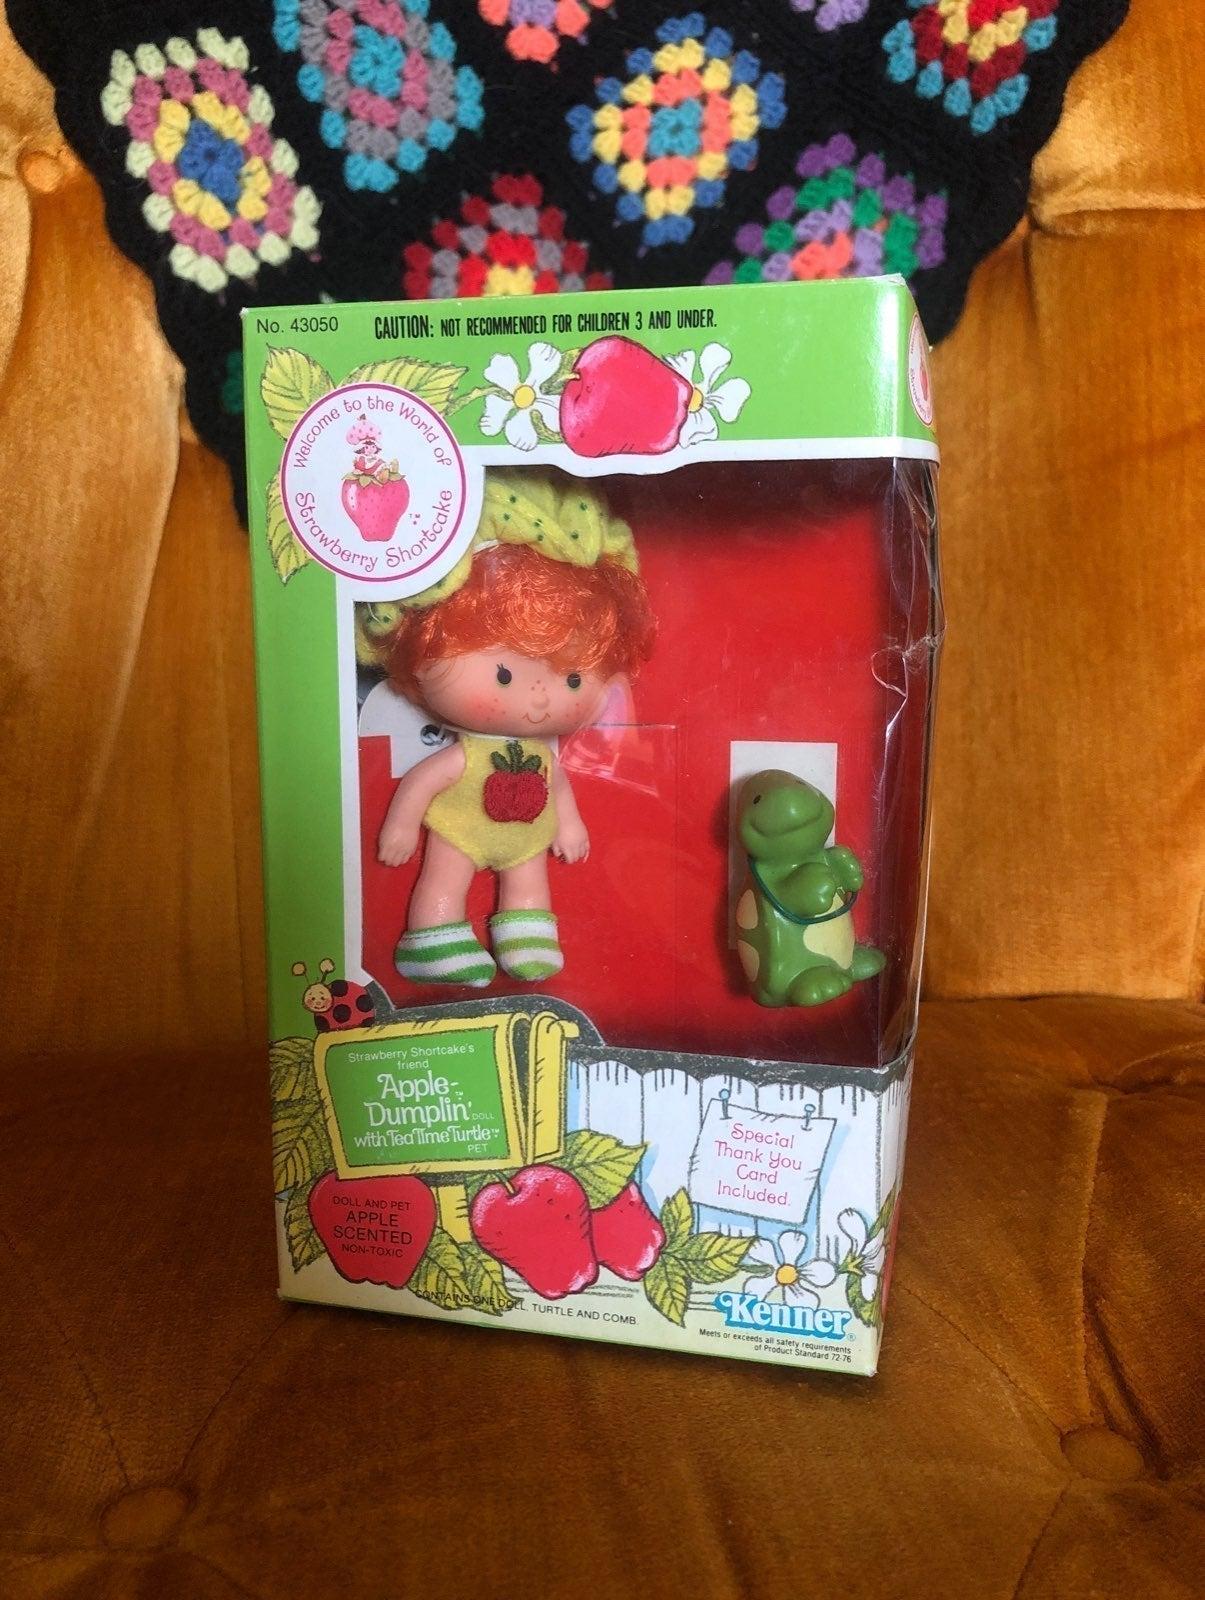 Strawberry Shortcake Apple Dumplin